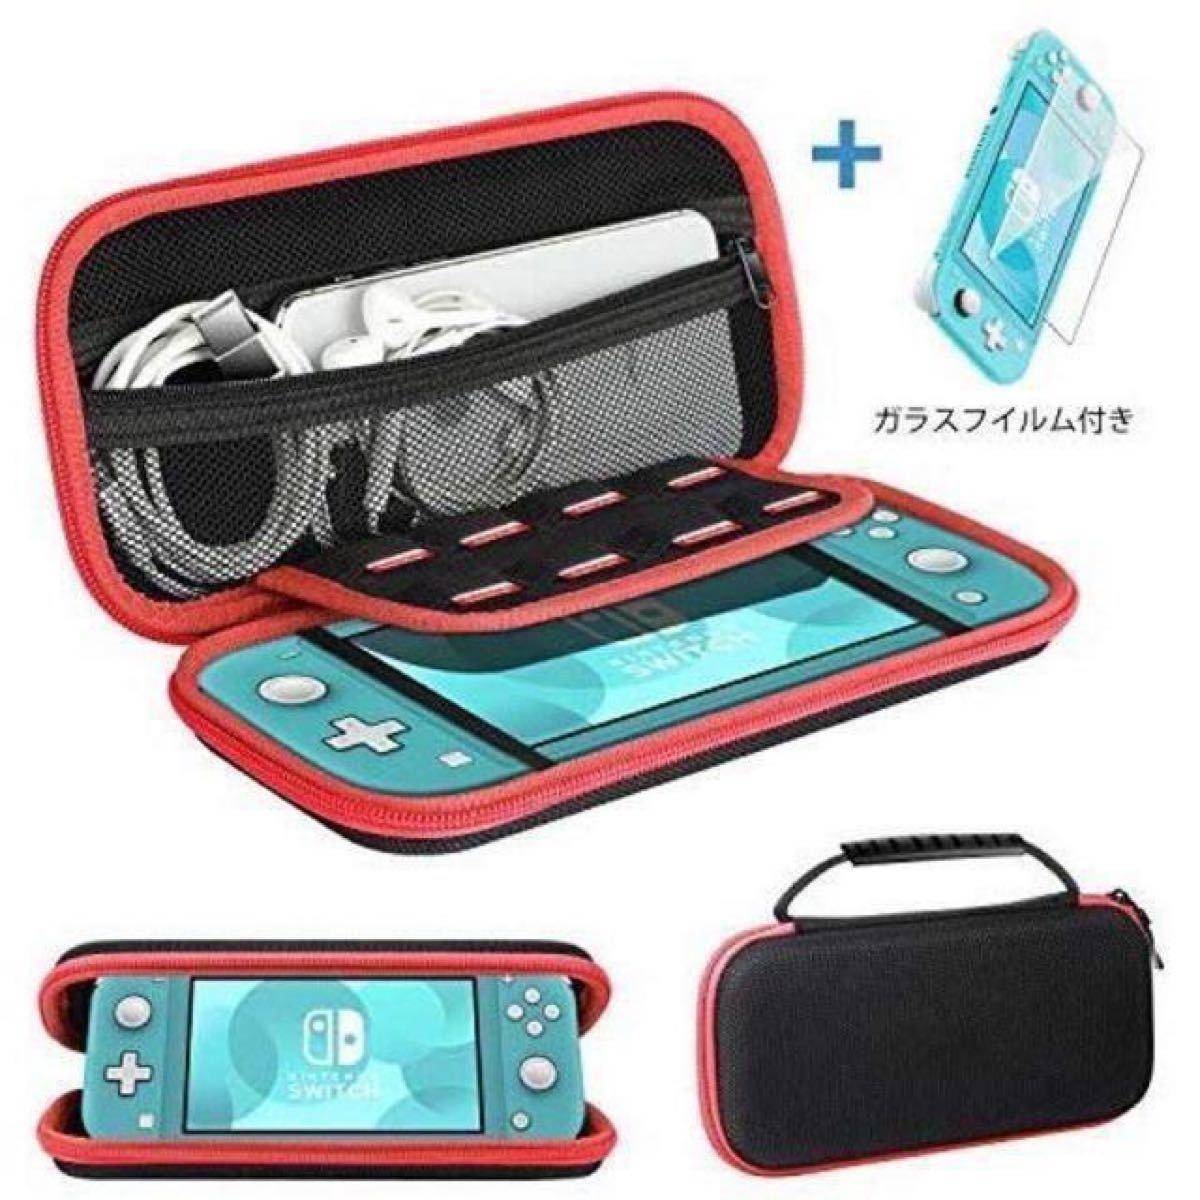 Nintendo Switch 任天堂スイッチケース 収納バッグ 保護フィルム